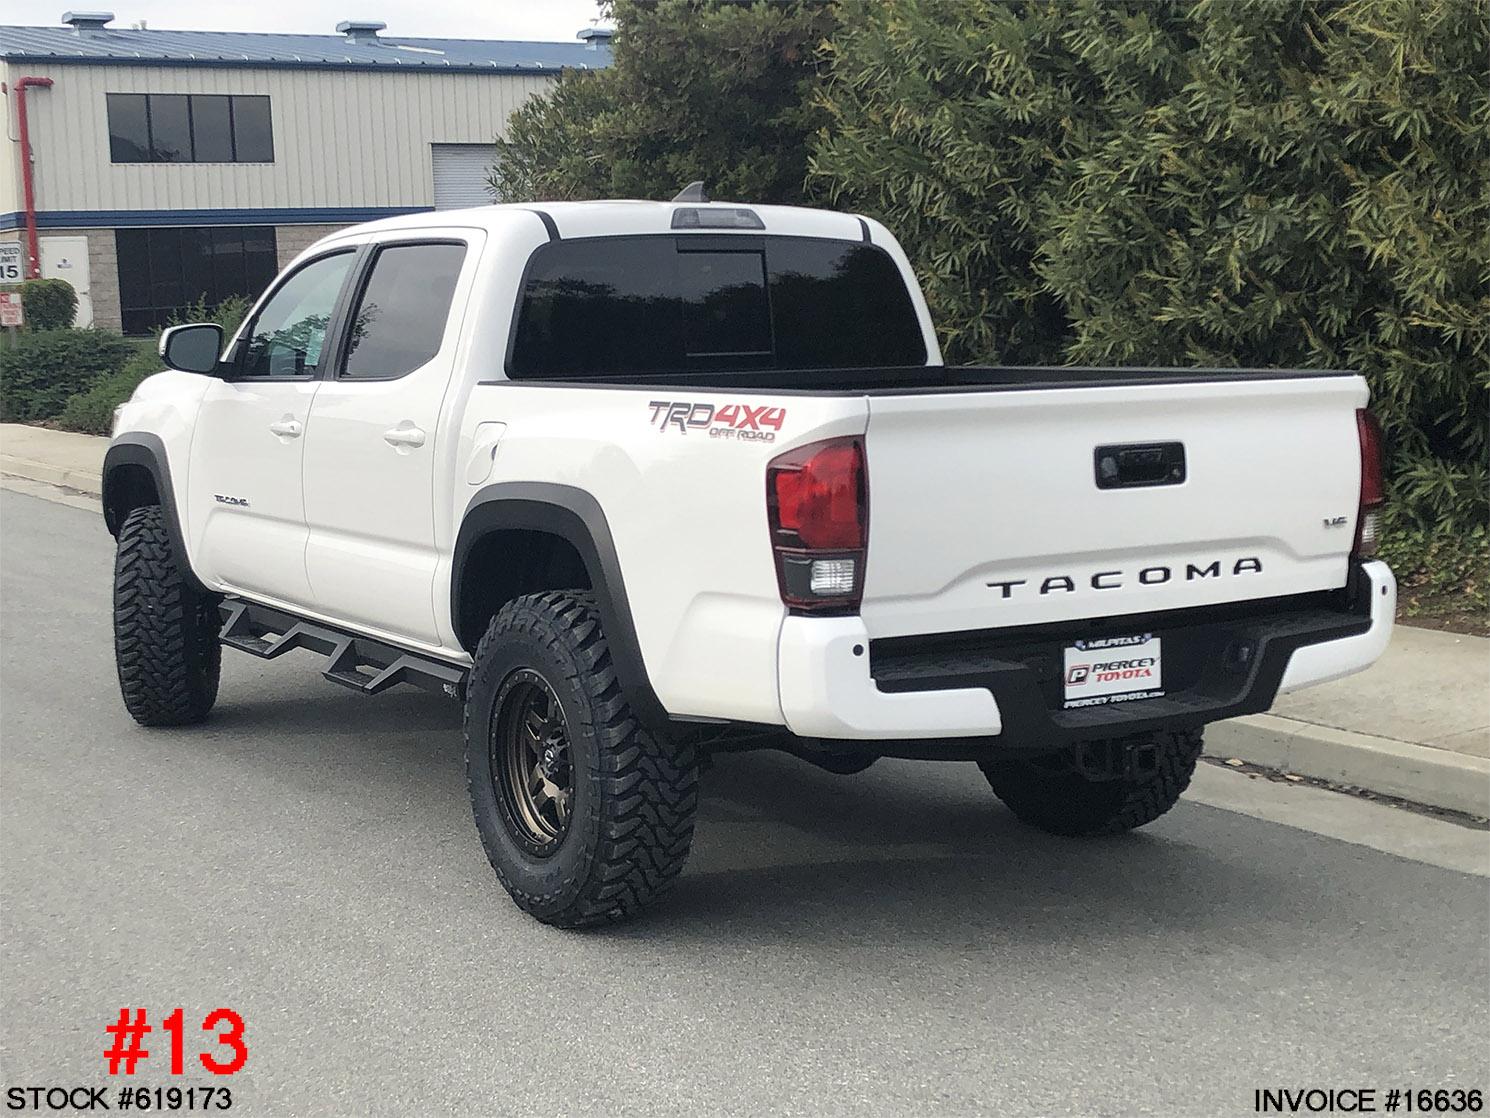 619173-2019 Toyota Tacoma Crew Cab